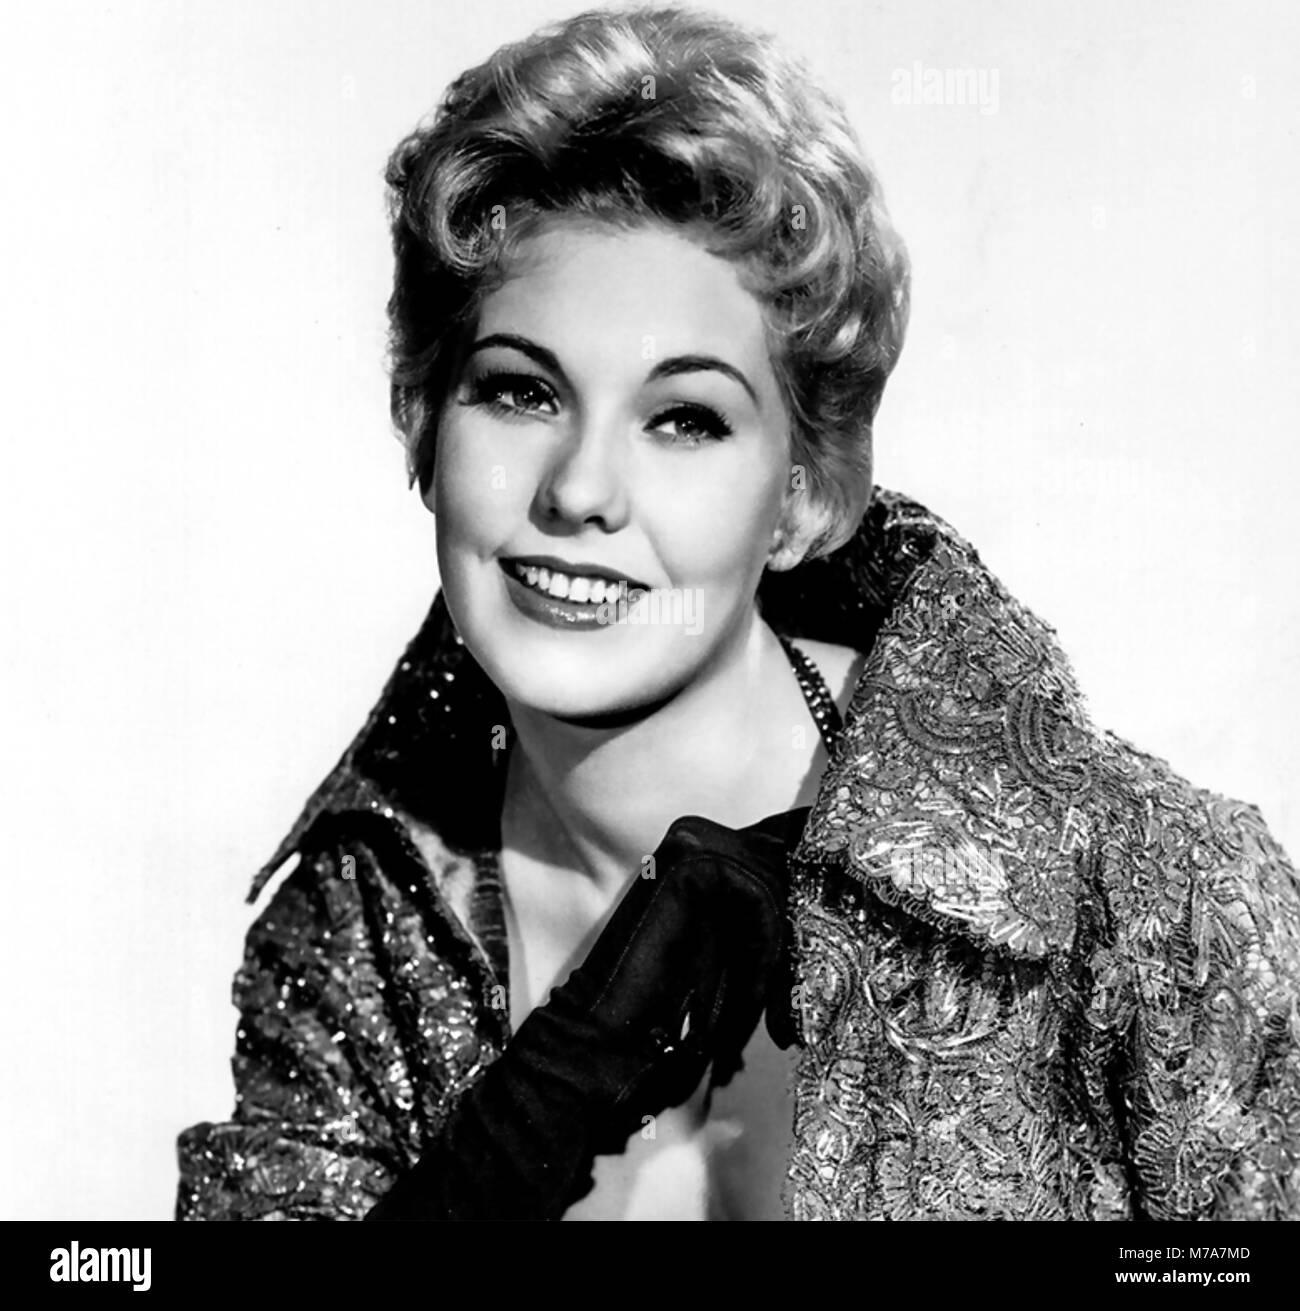 KIM NOVAK  Amwerican film and TV actress about 1955 - Stock Image